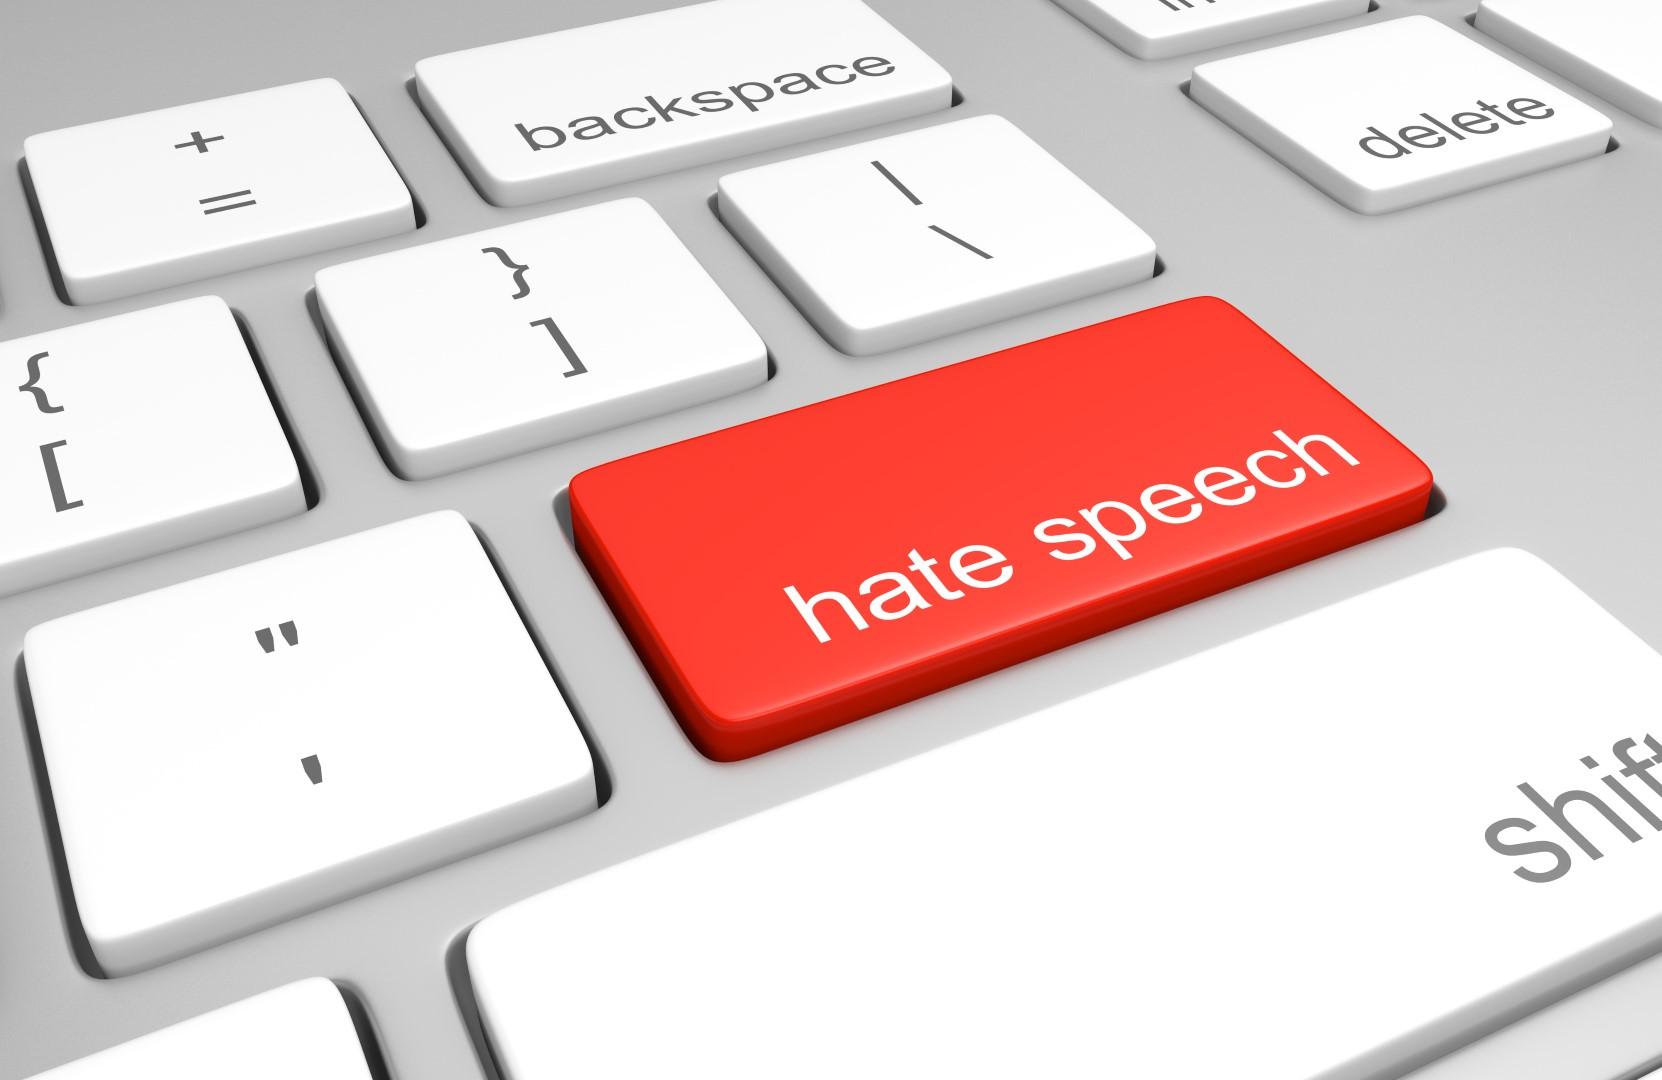 hate-speech-Large.jpg